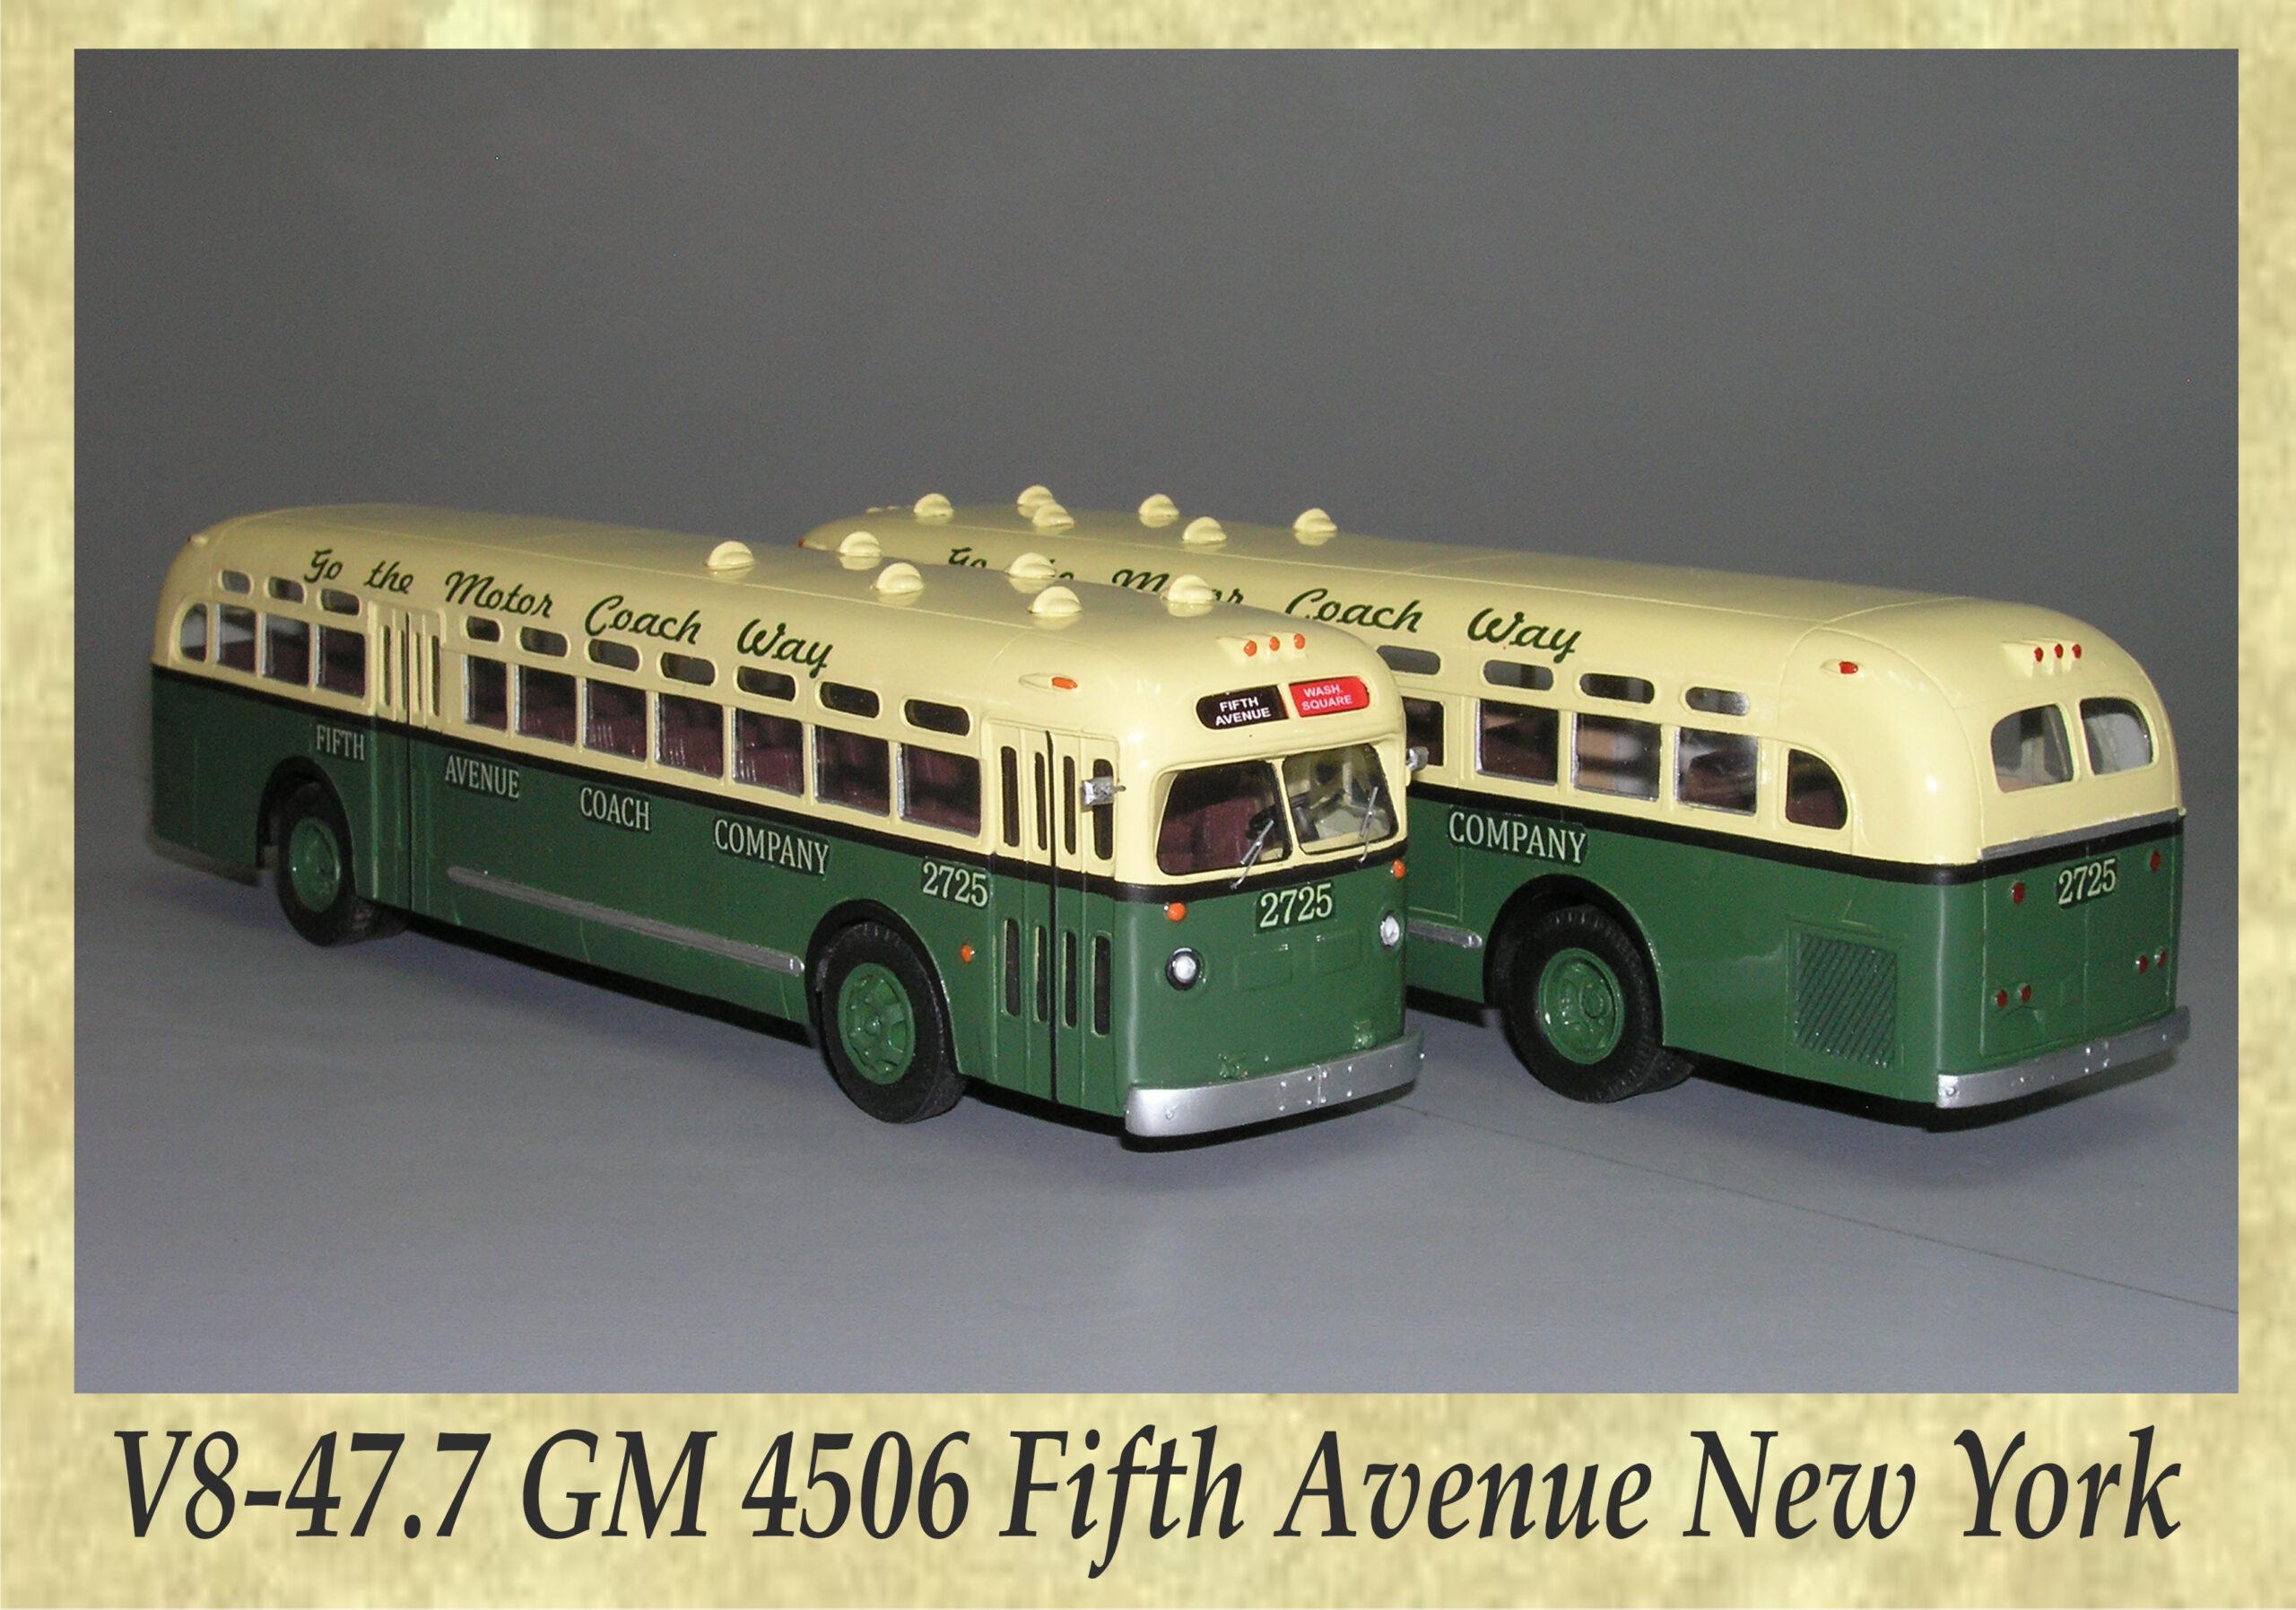 V8-47.7 GM 4506 Fifth Avenue New York